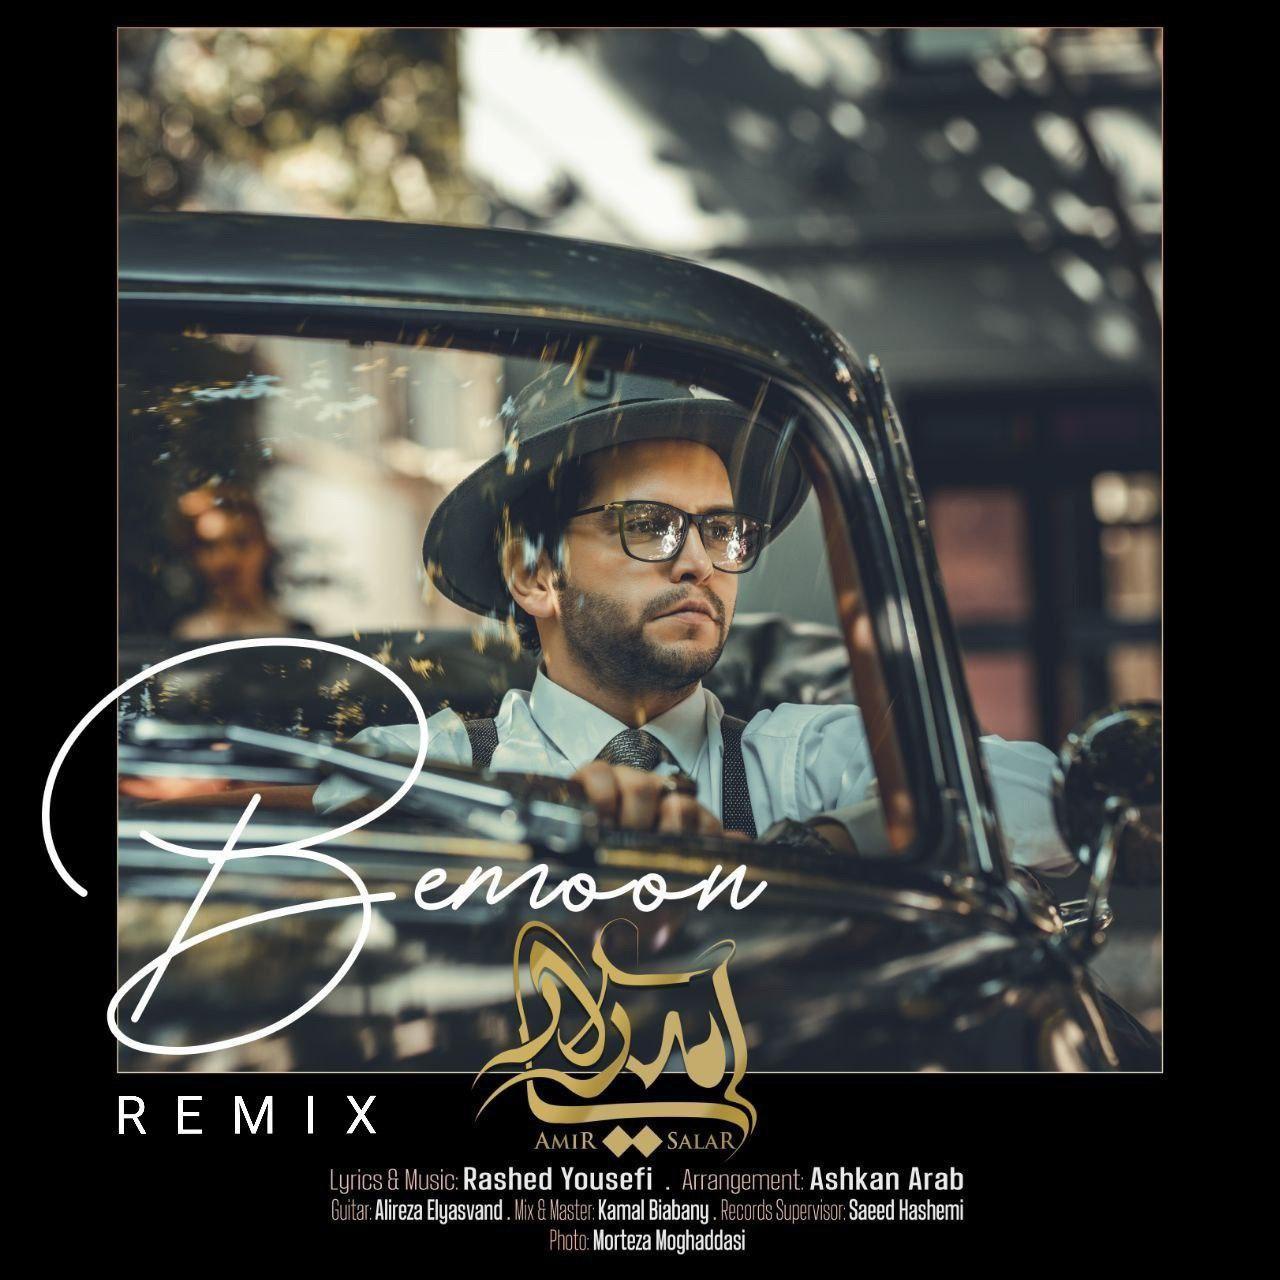 Amir Salar – Bemon (Remix)